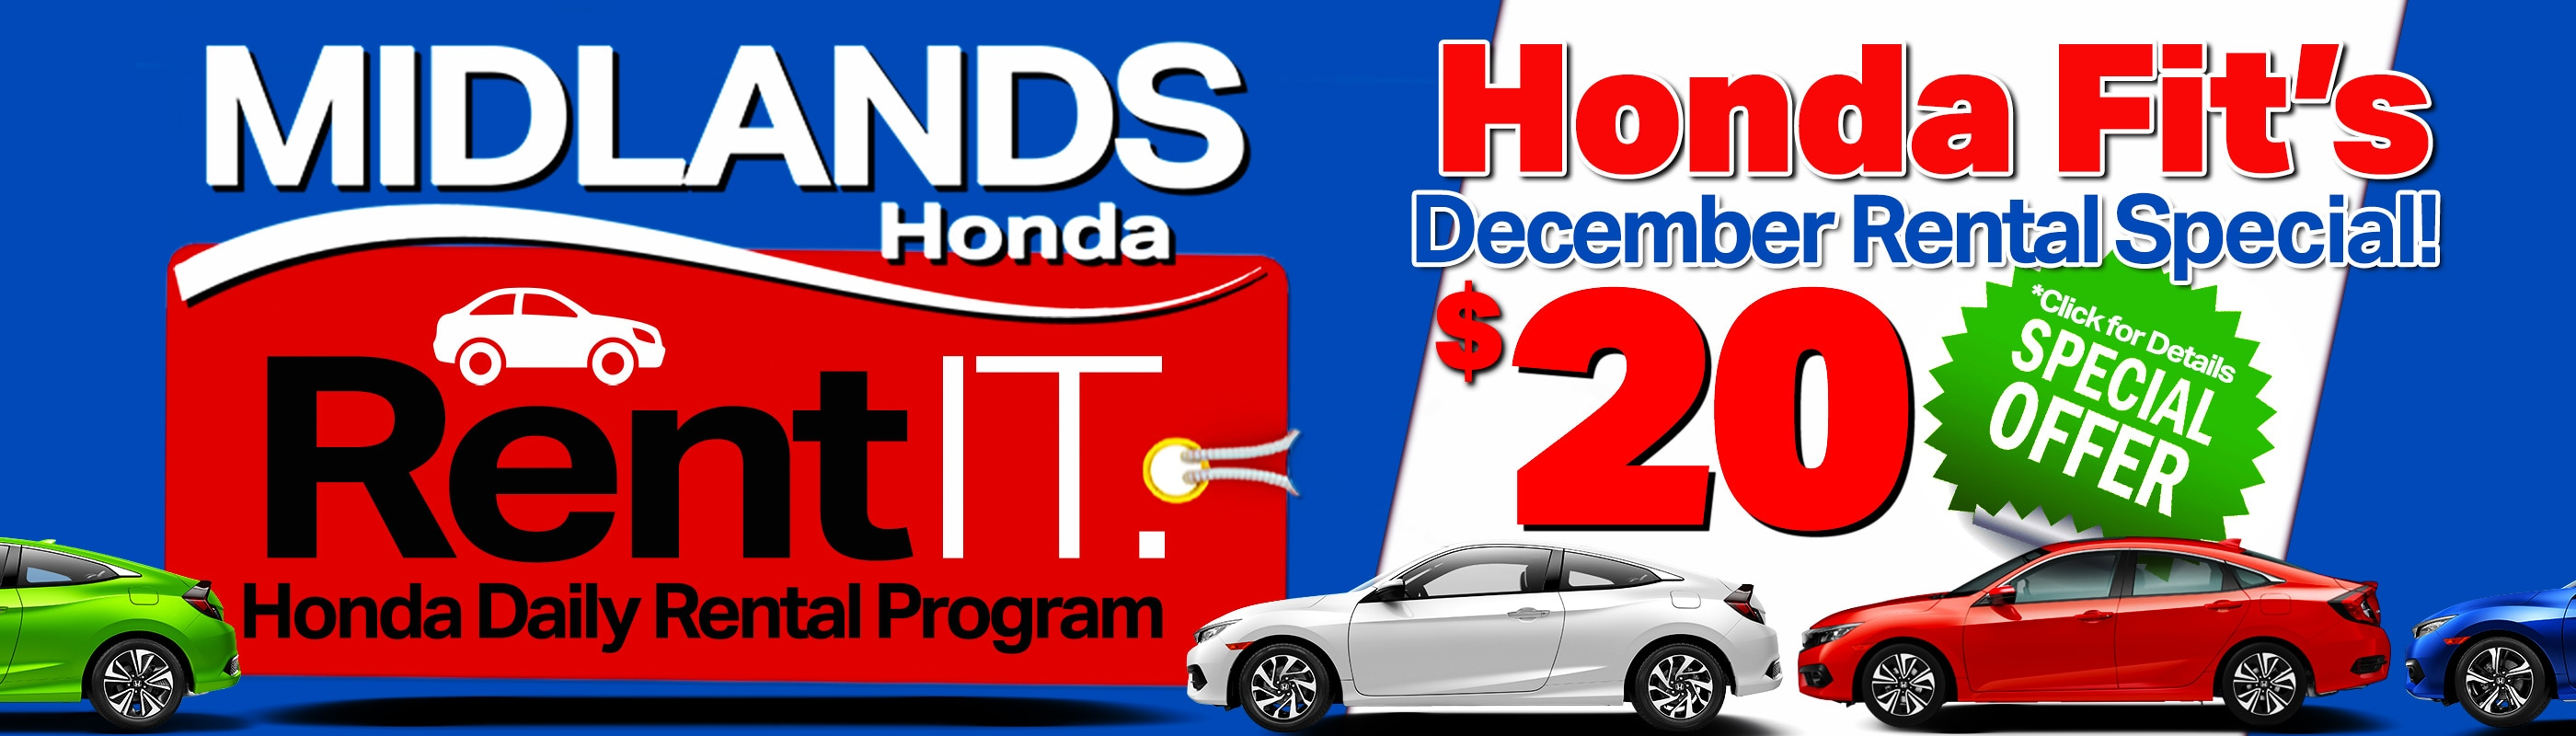 Midlands Honda